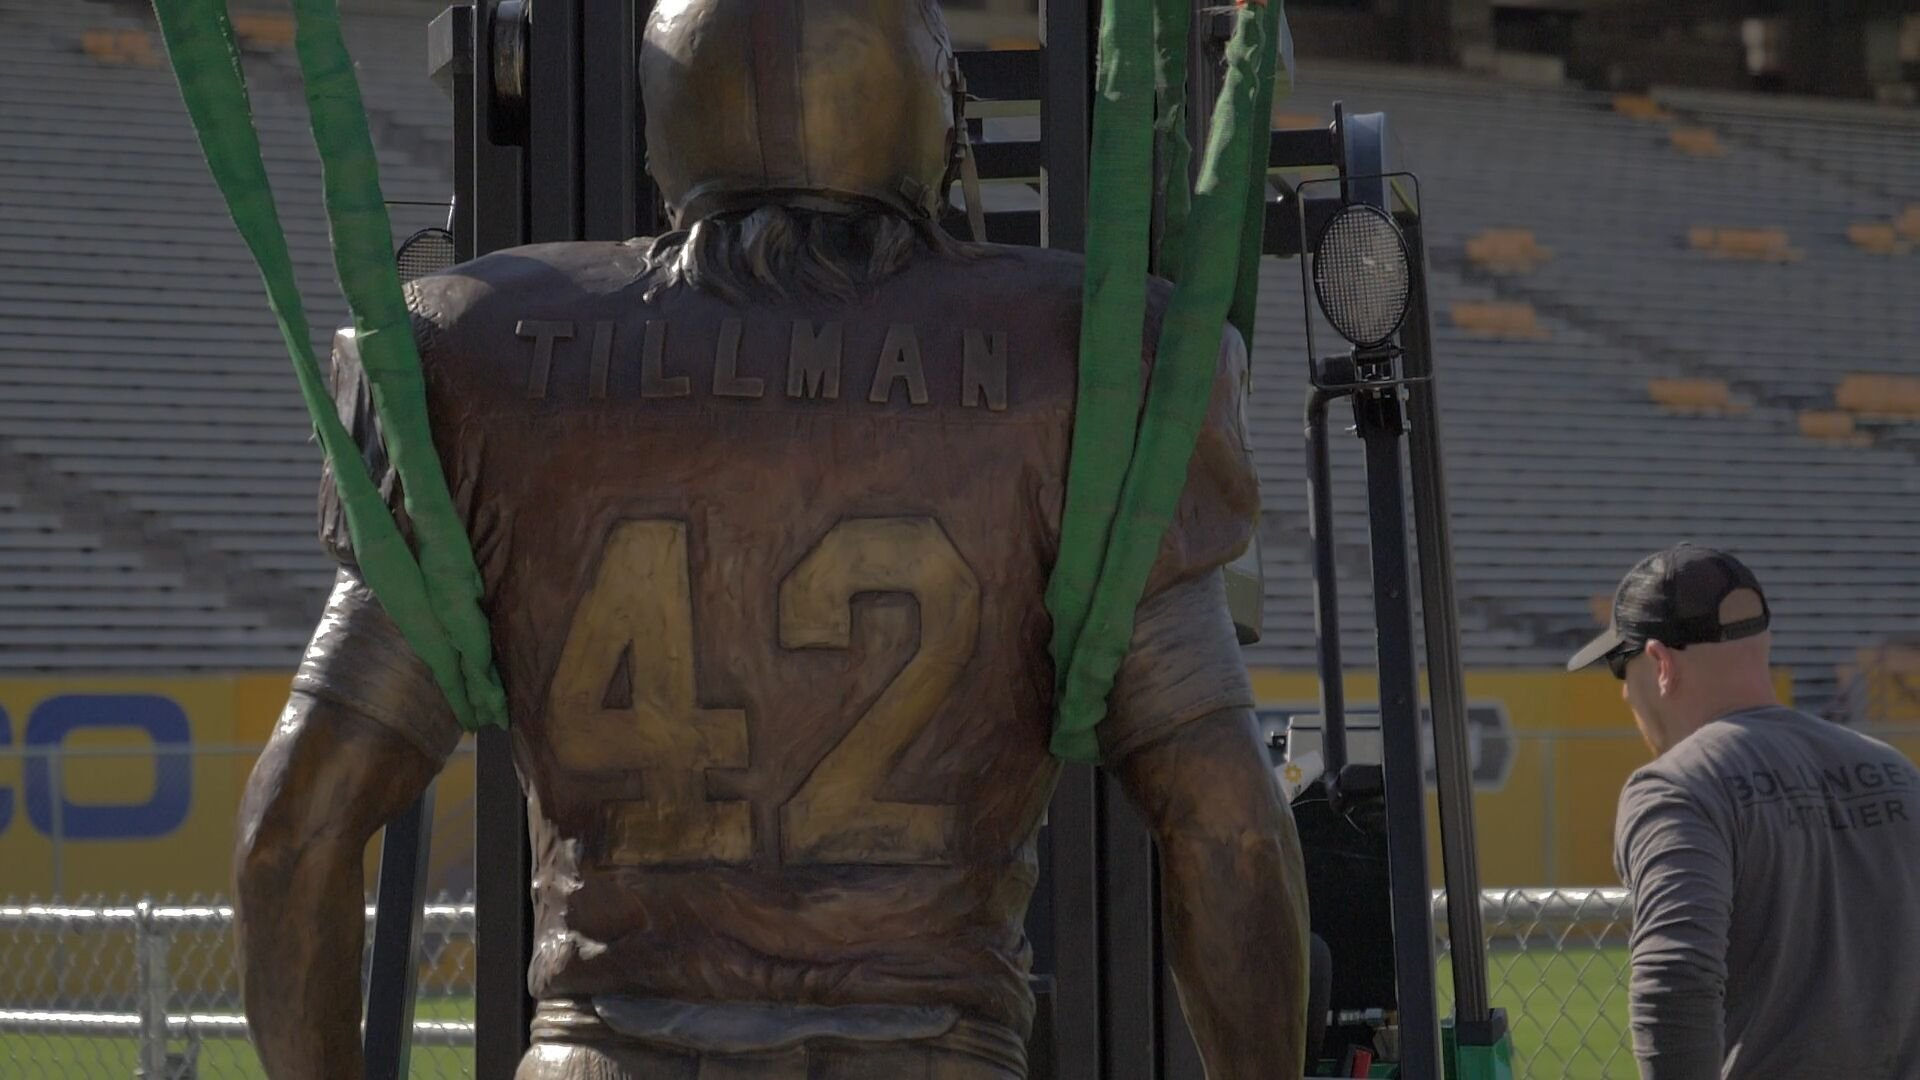 The Tillman statue being installed (Photo: Sun Devil Athletics)